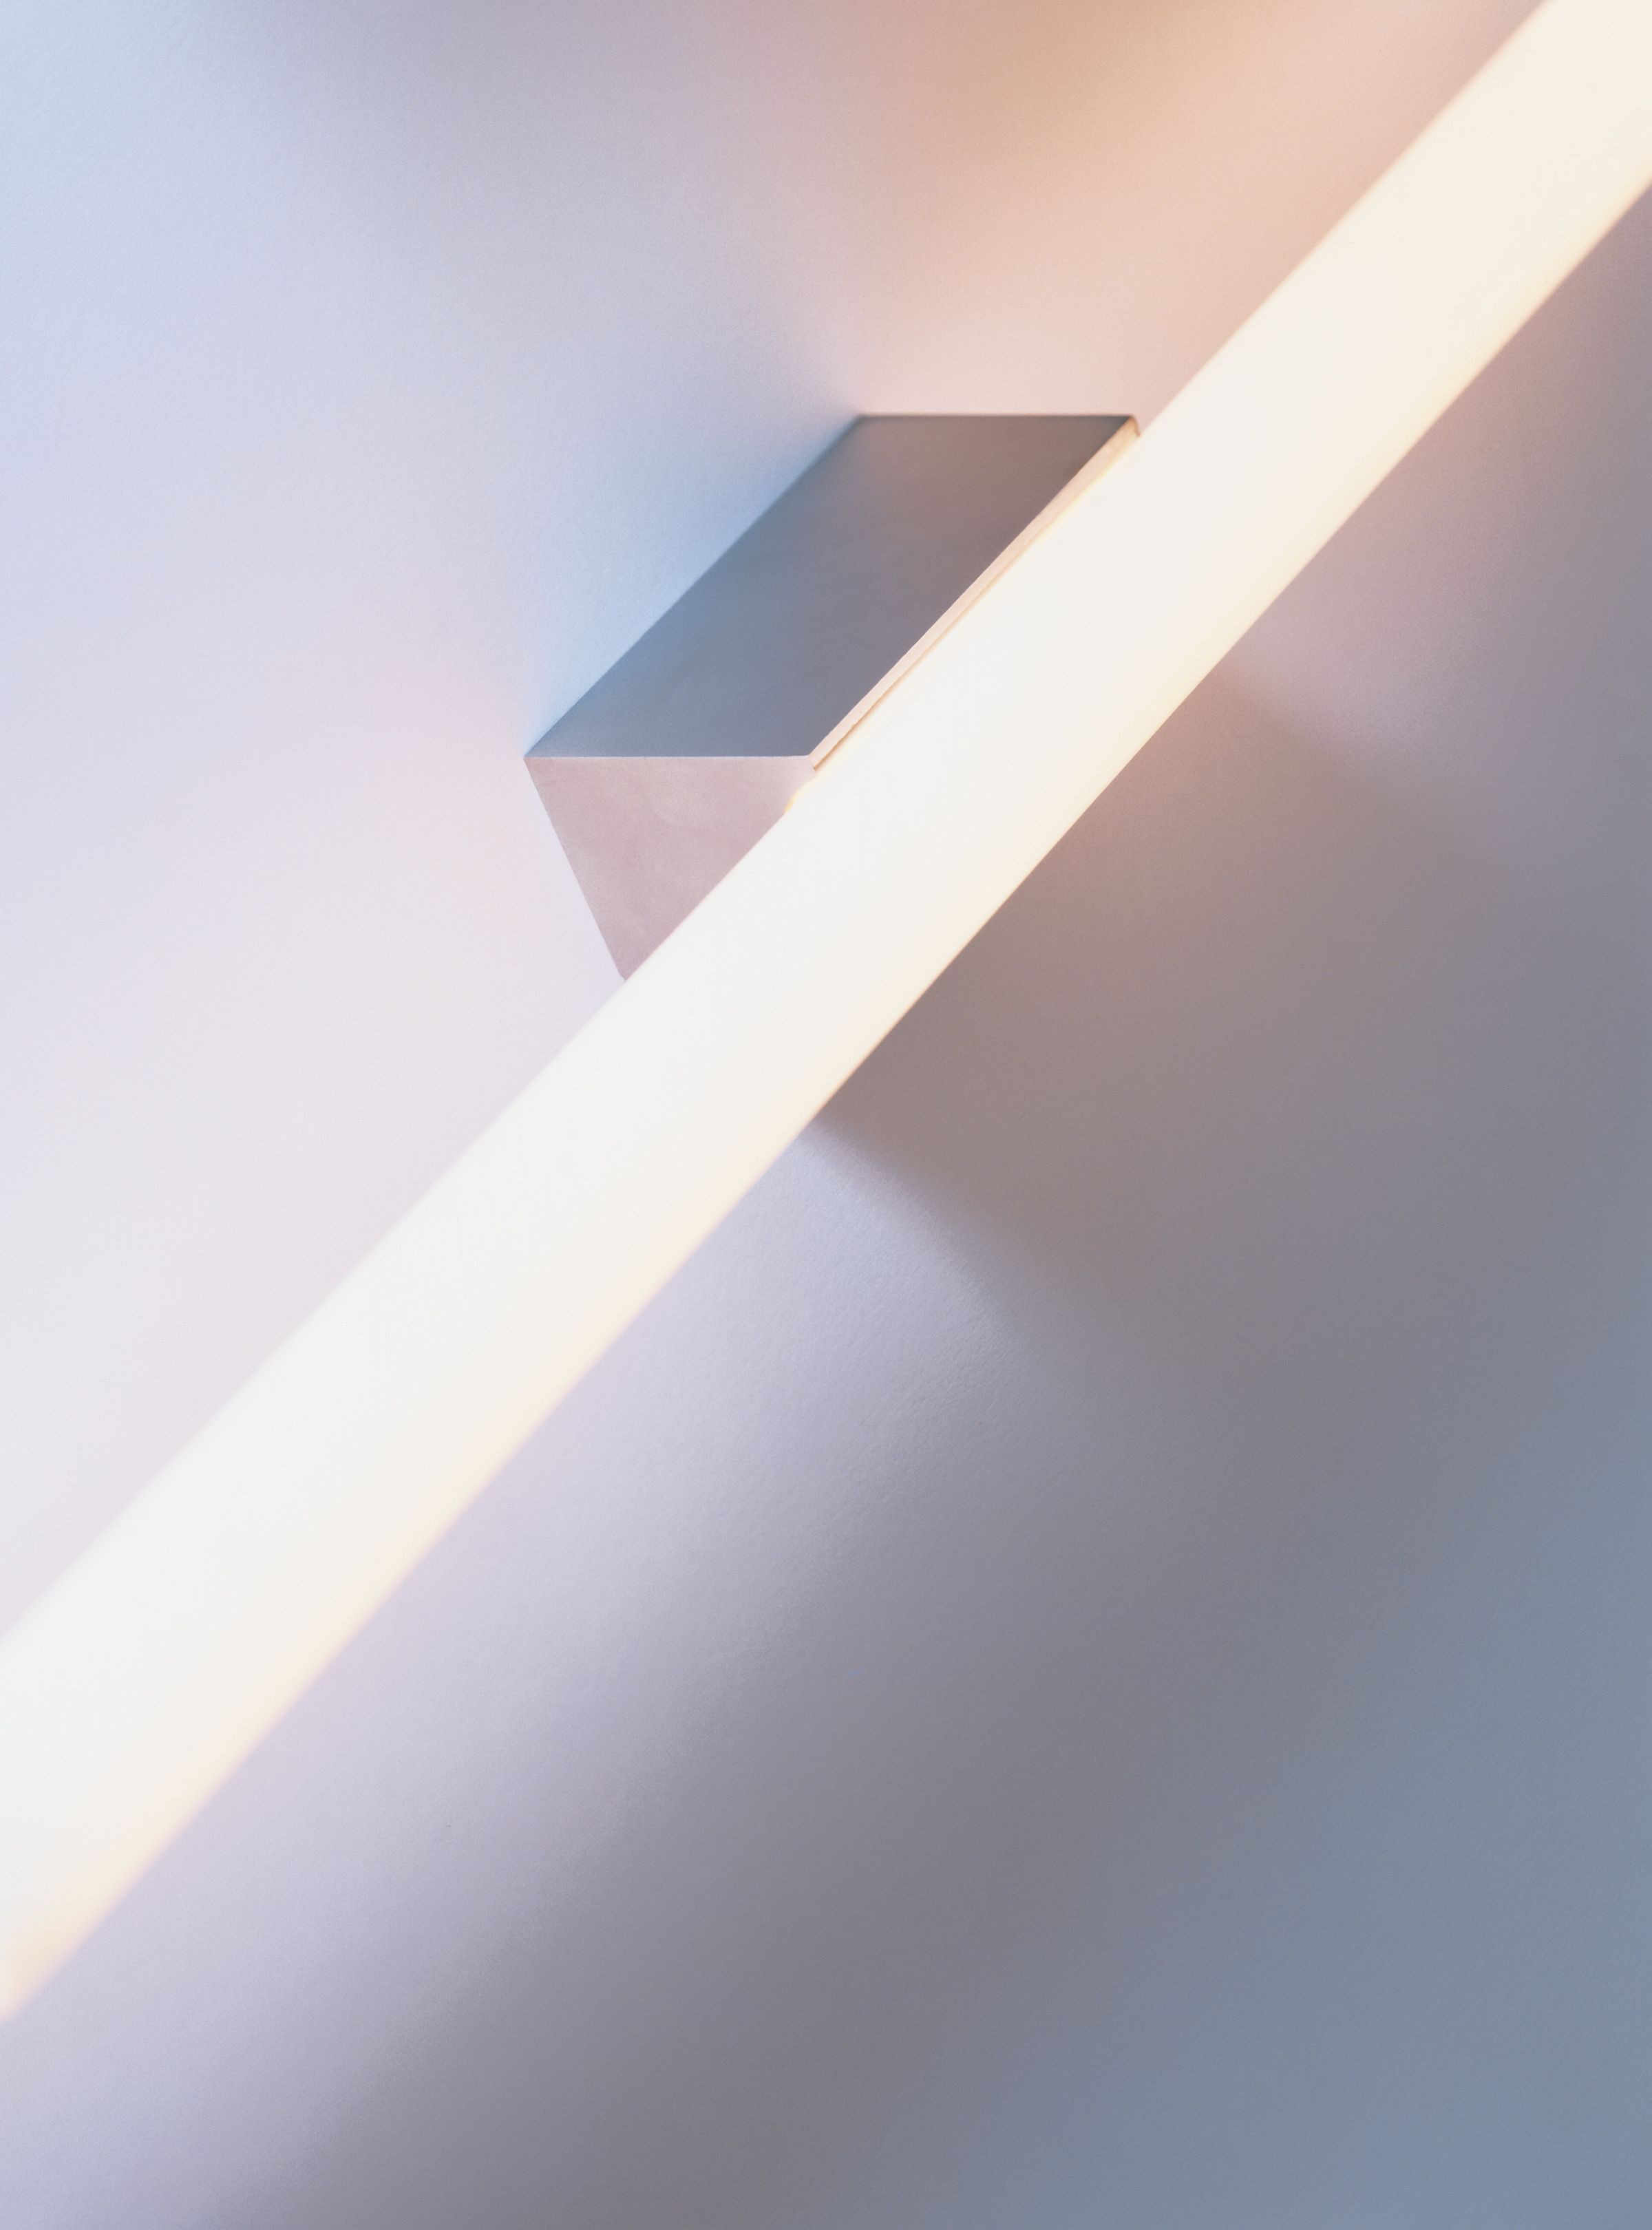 Top Light Lichtstange 1 Sockel | Light | Pinterest | Top light und ...